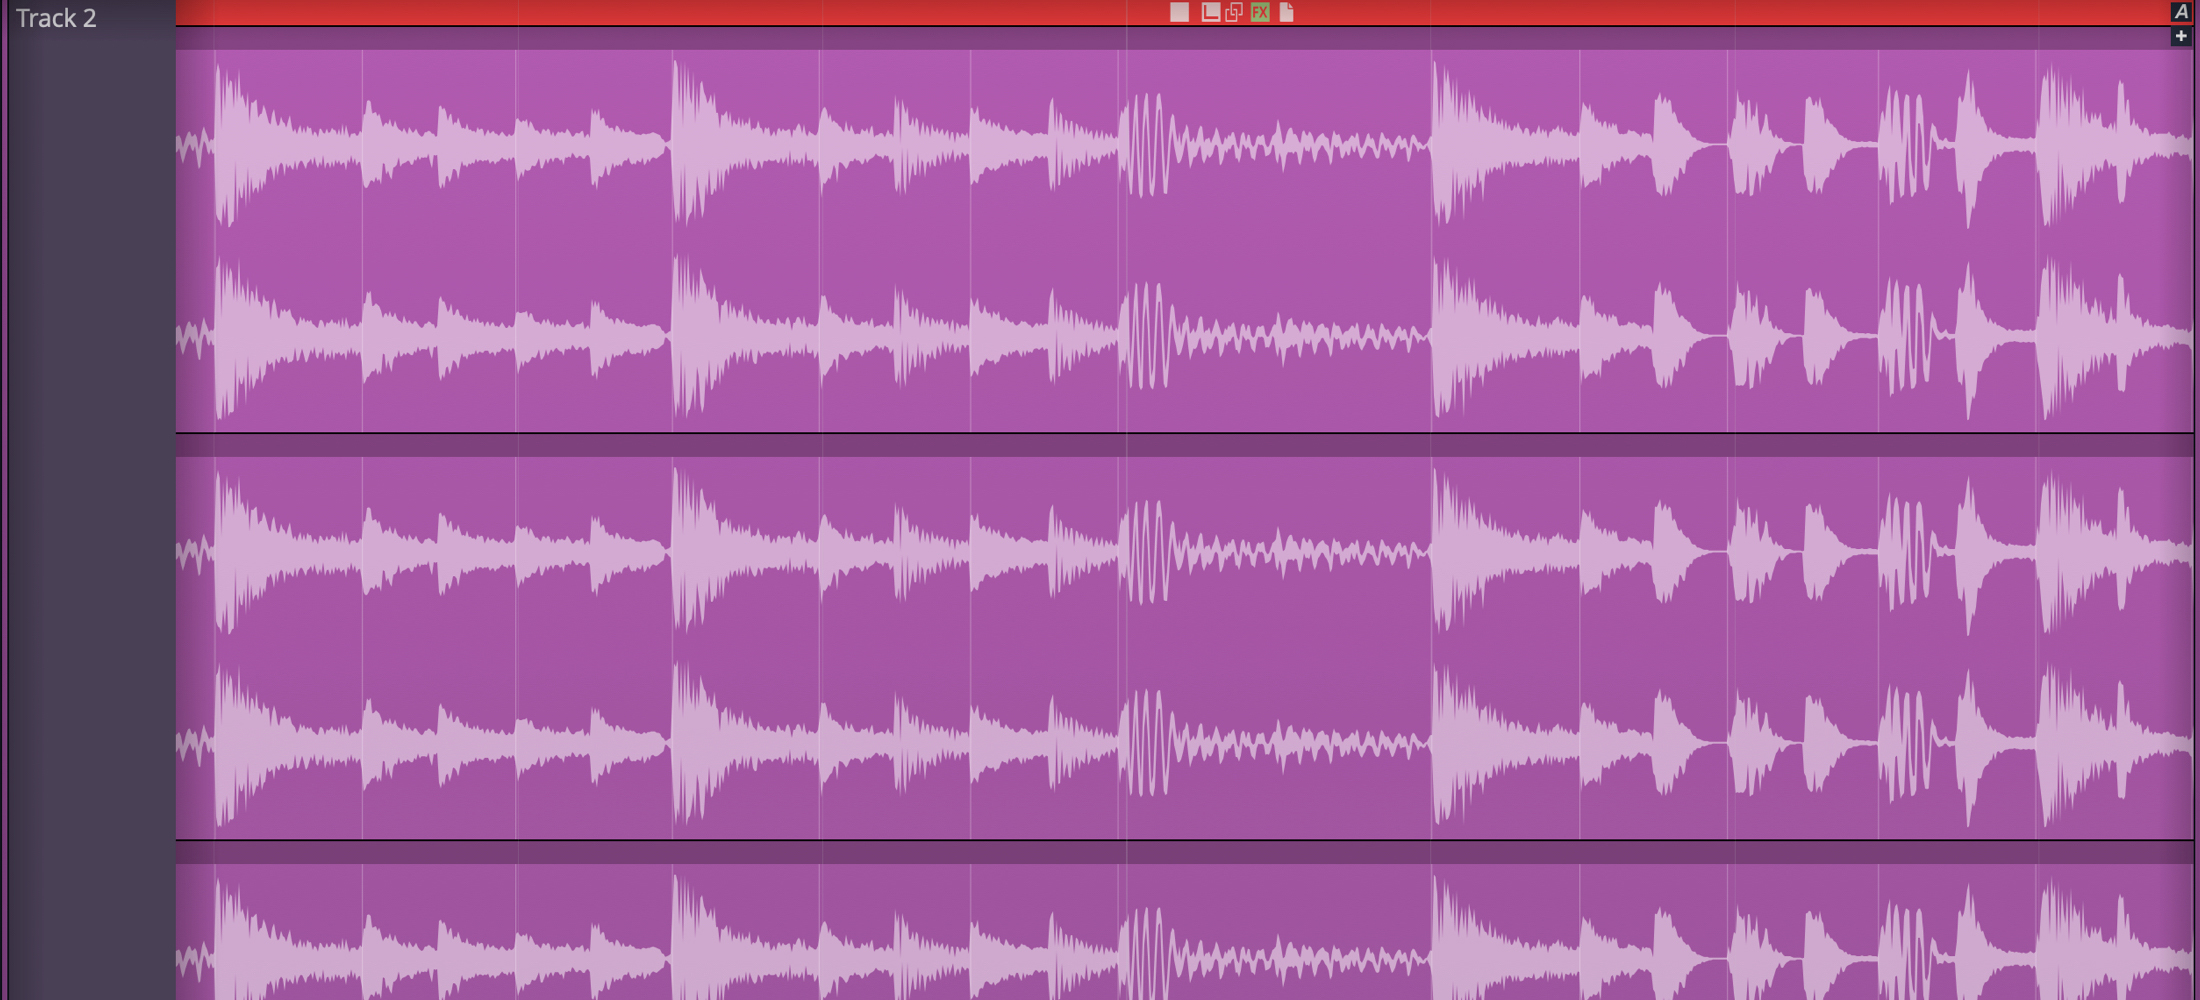 Tracktion Launch Waveform 10 – MusicPlayers com